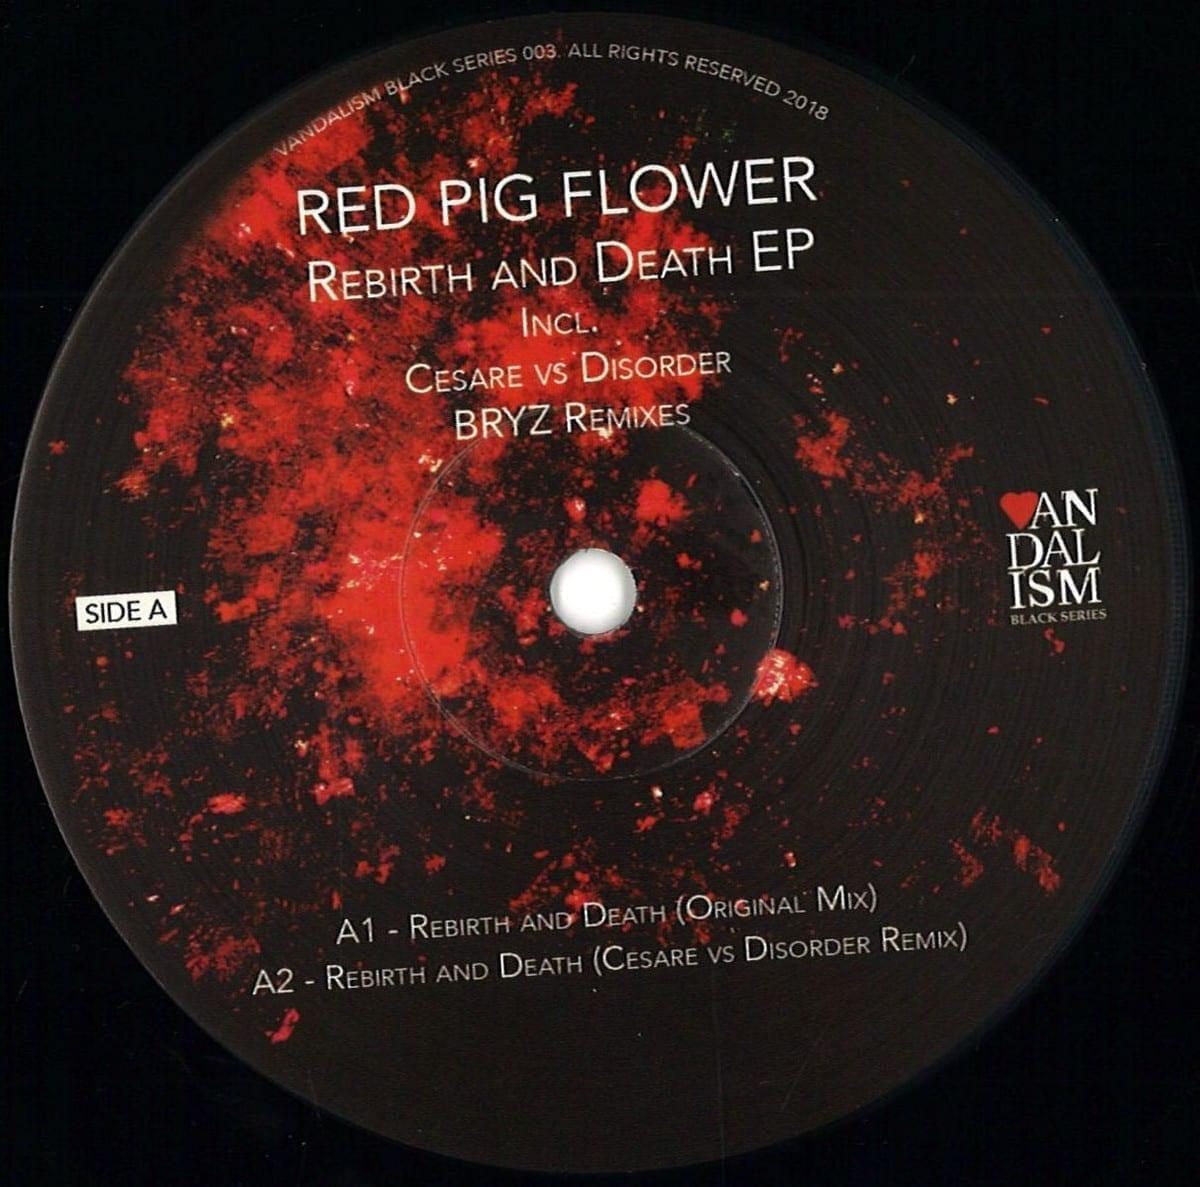 red pig flower - rebirth and death ep [vandalism black series] front